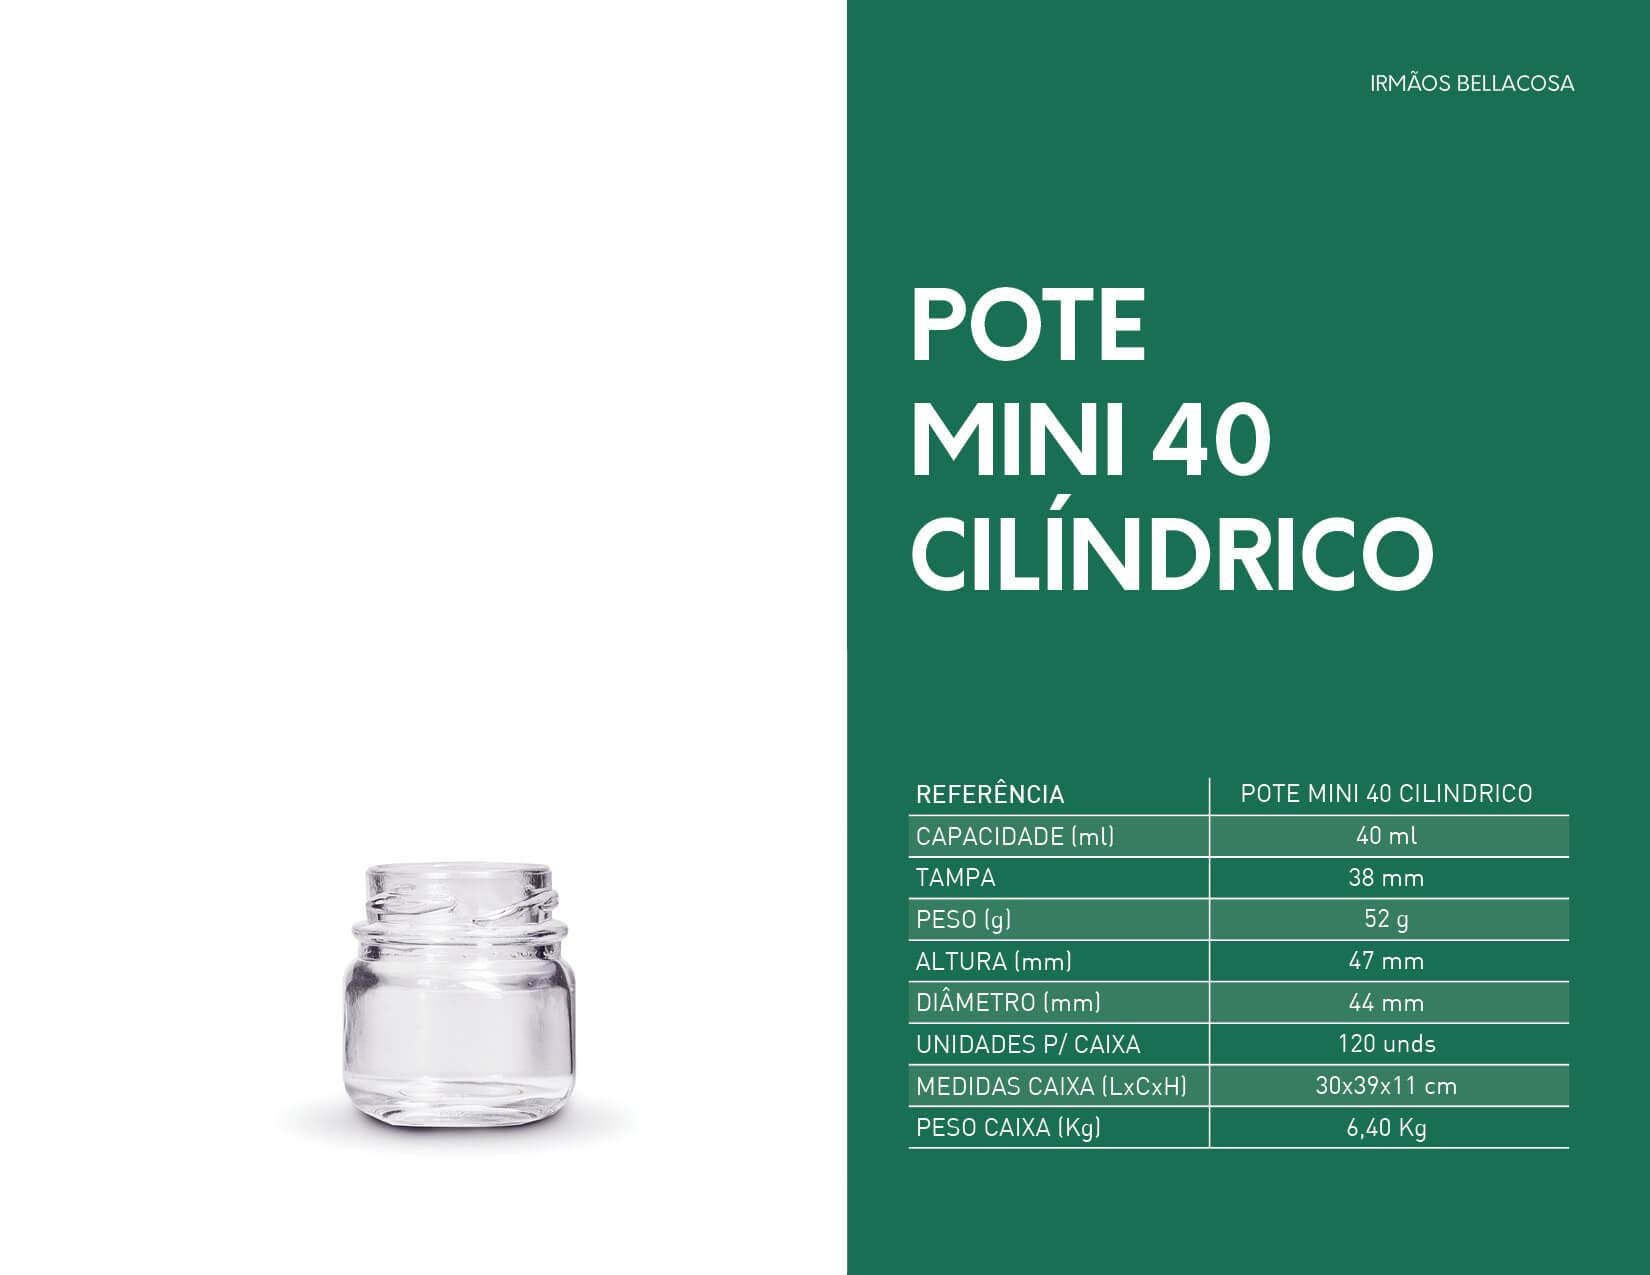 028-Pote-Mini-40-cilindrico-irmaos-bellacosa-embalagens-de-vidro